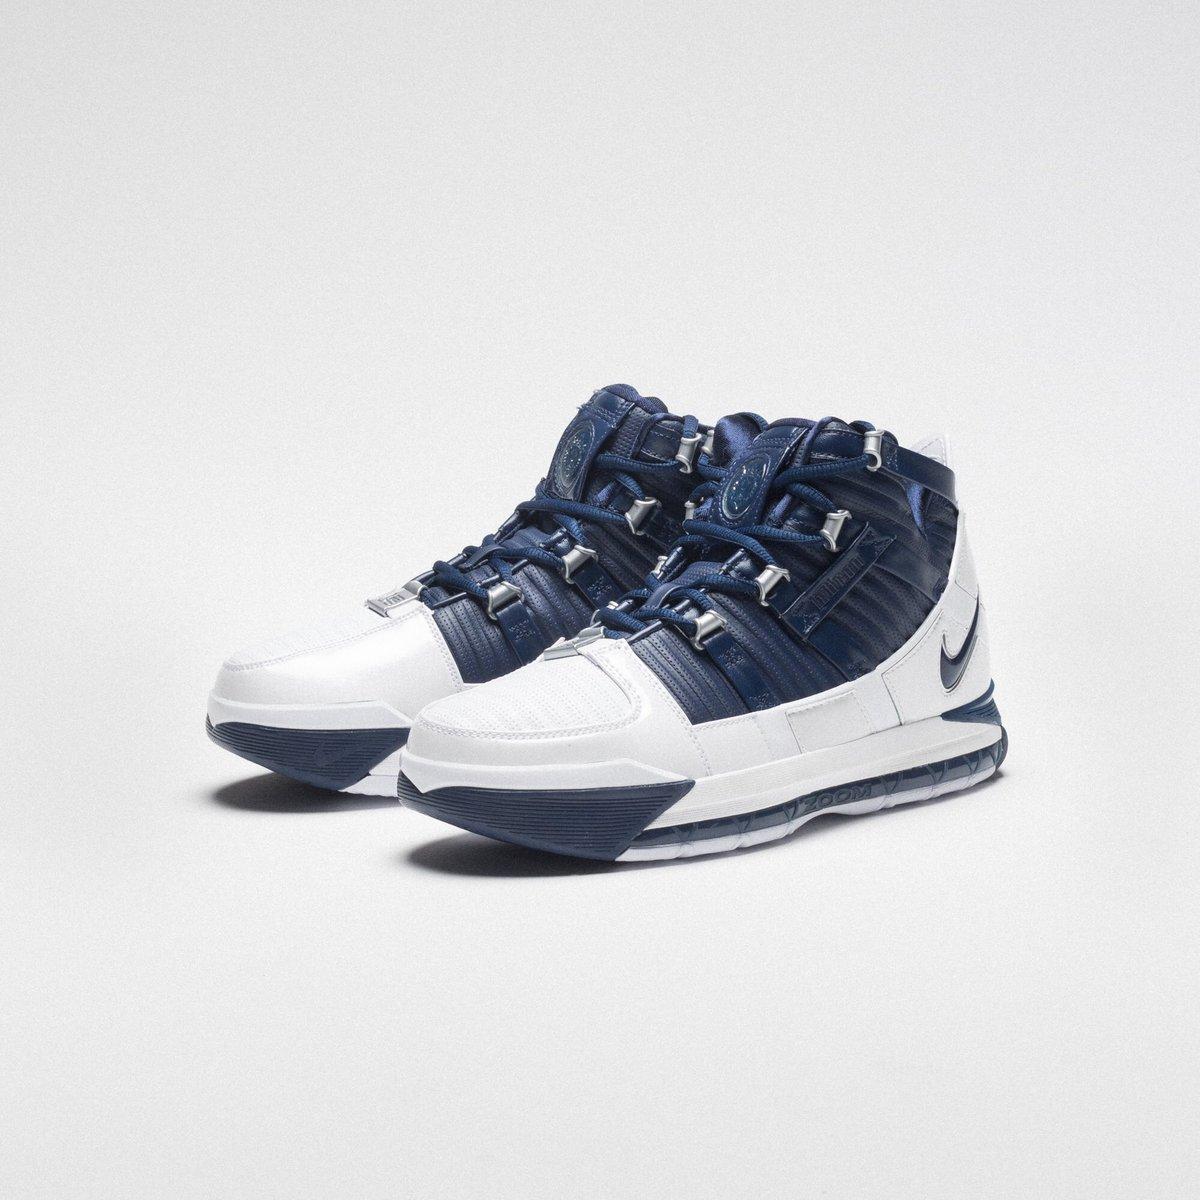 wholesale dealer 2dc6f 0a8dd Nike Zoom Lebron 3